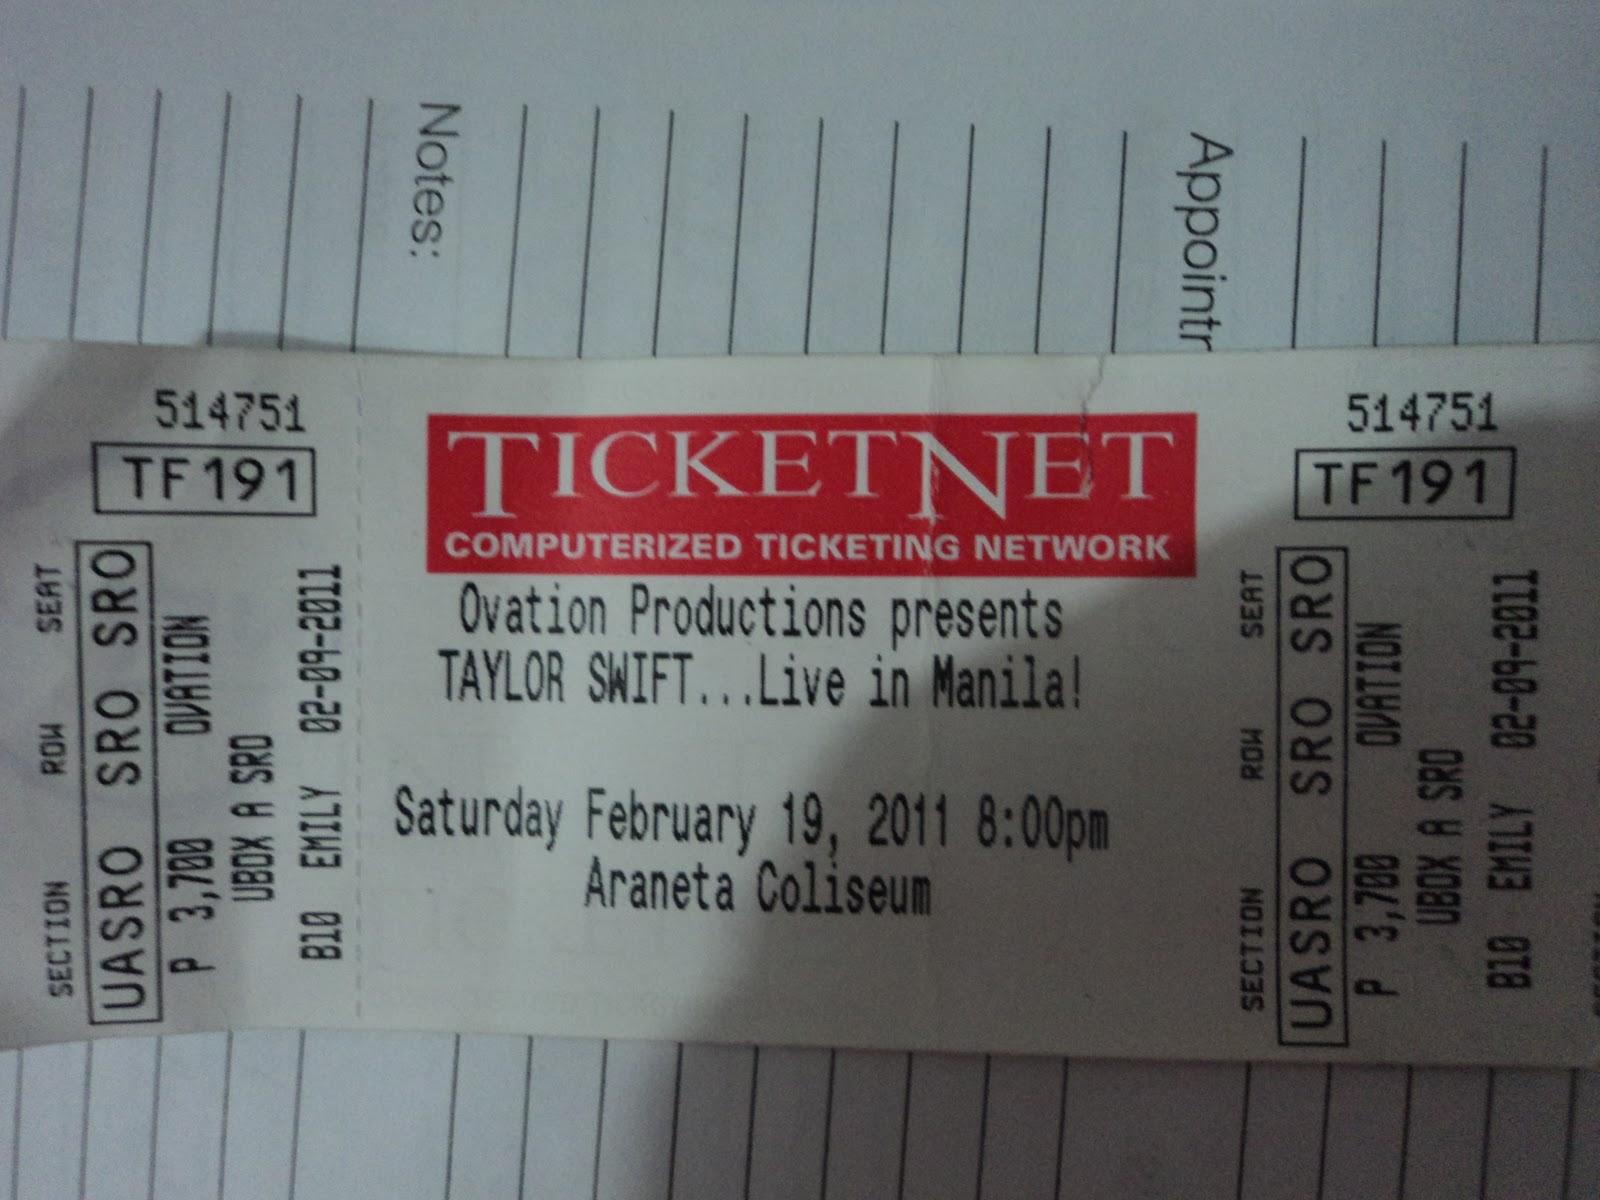 http://3.bp.blogspot.com/-fAG56km9Tf4/TWApBav4VkI/AAAAAAAABjc/-Cnq3MuFJX8/s1600/Taylor+Swift+Concert+Feb+19+2011+086.JPG